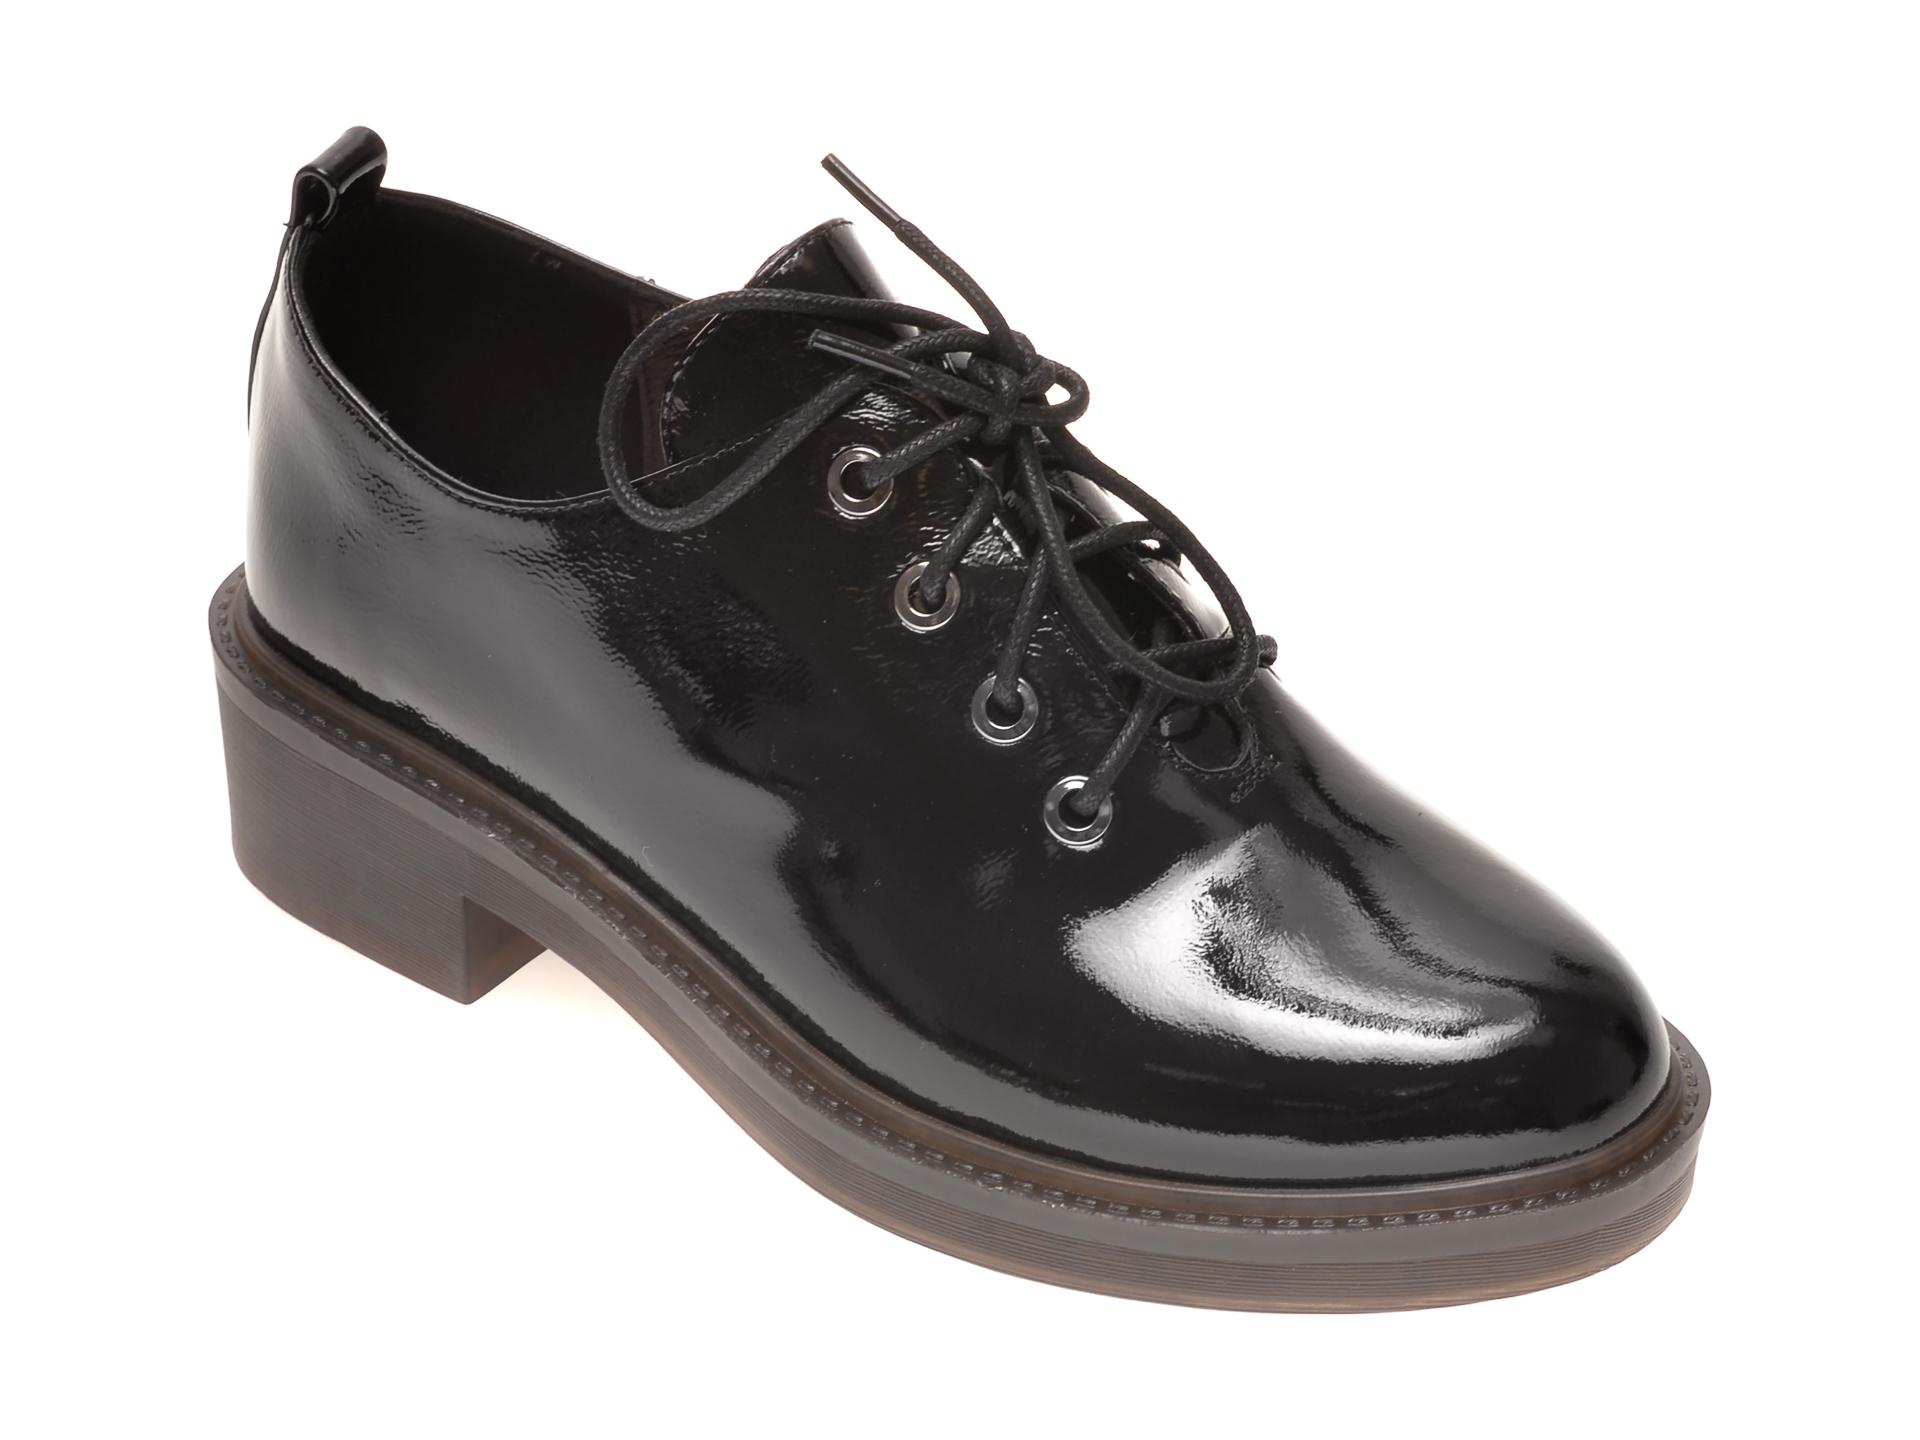 Pantofi EPICA negri, 2F606B0, din piele naturala lacuita imagine otter.ro